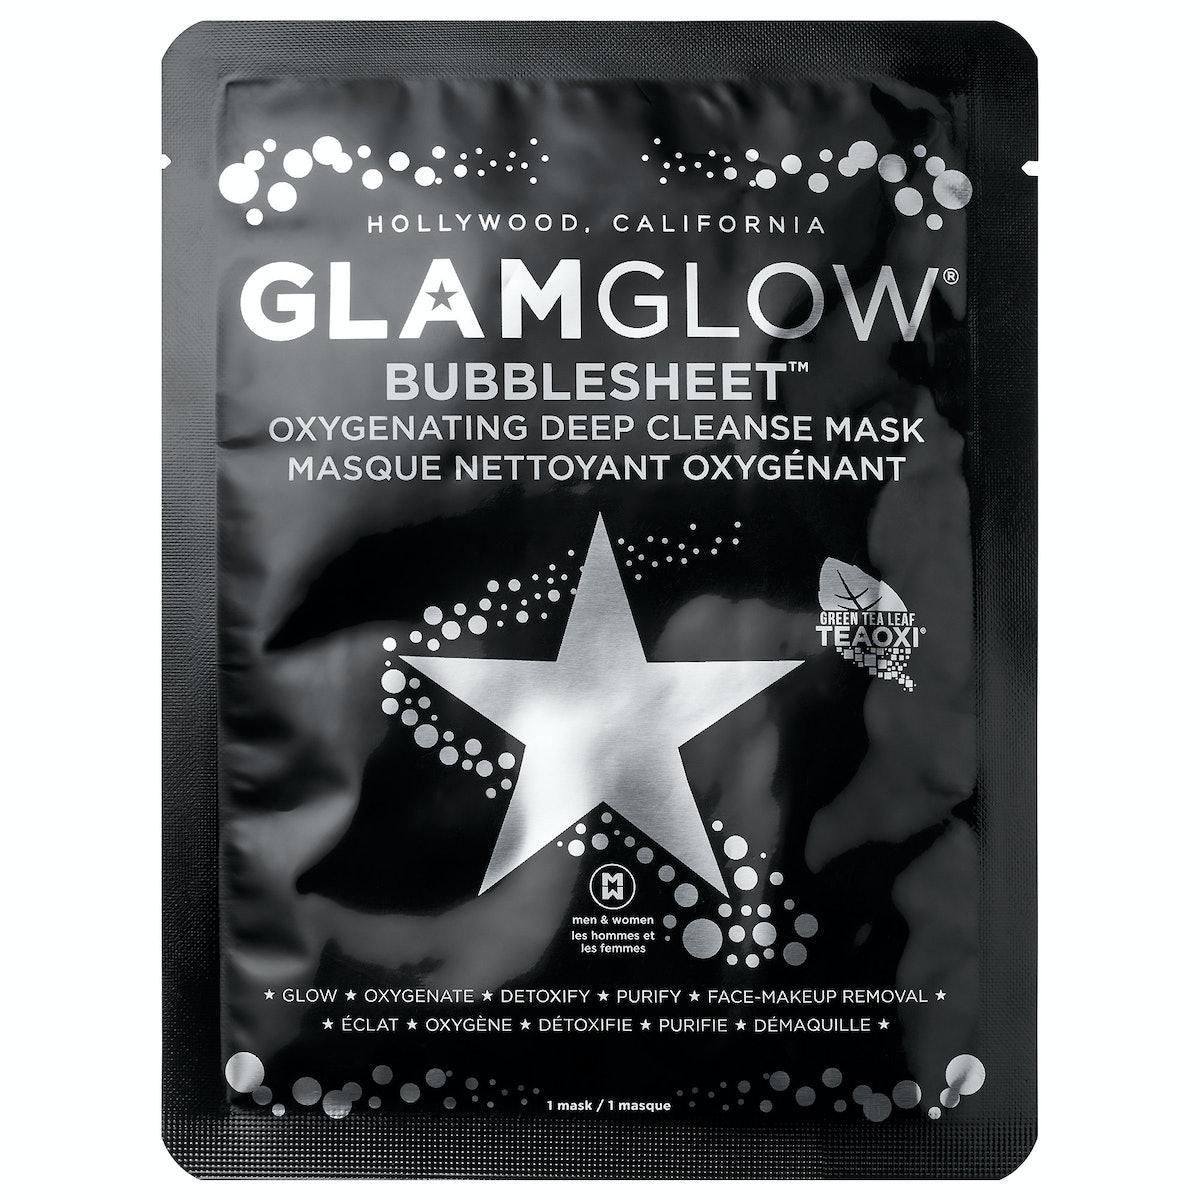 GLAMGLOW BUBBLESHEET Oxygenating Deep Cleanse Mask